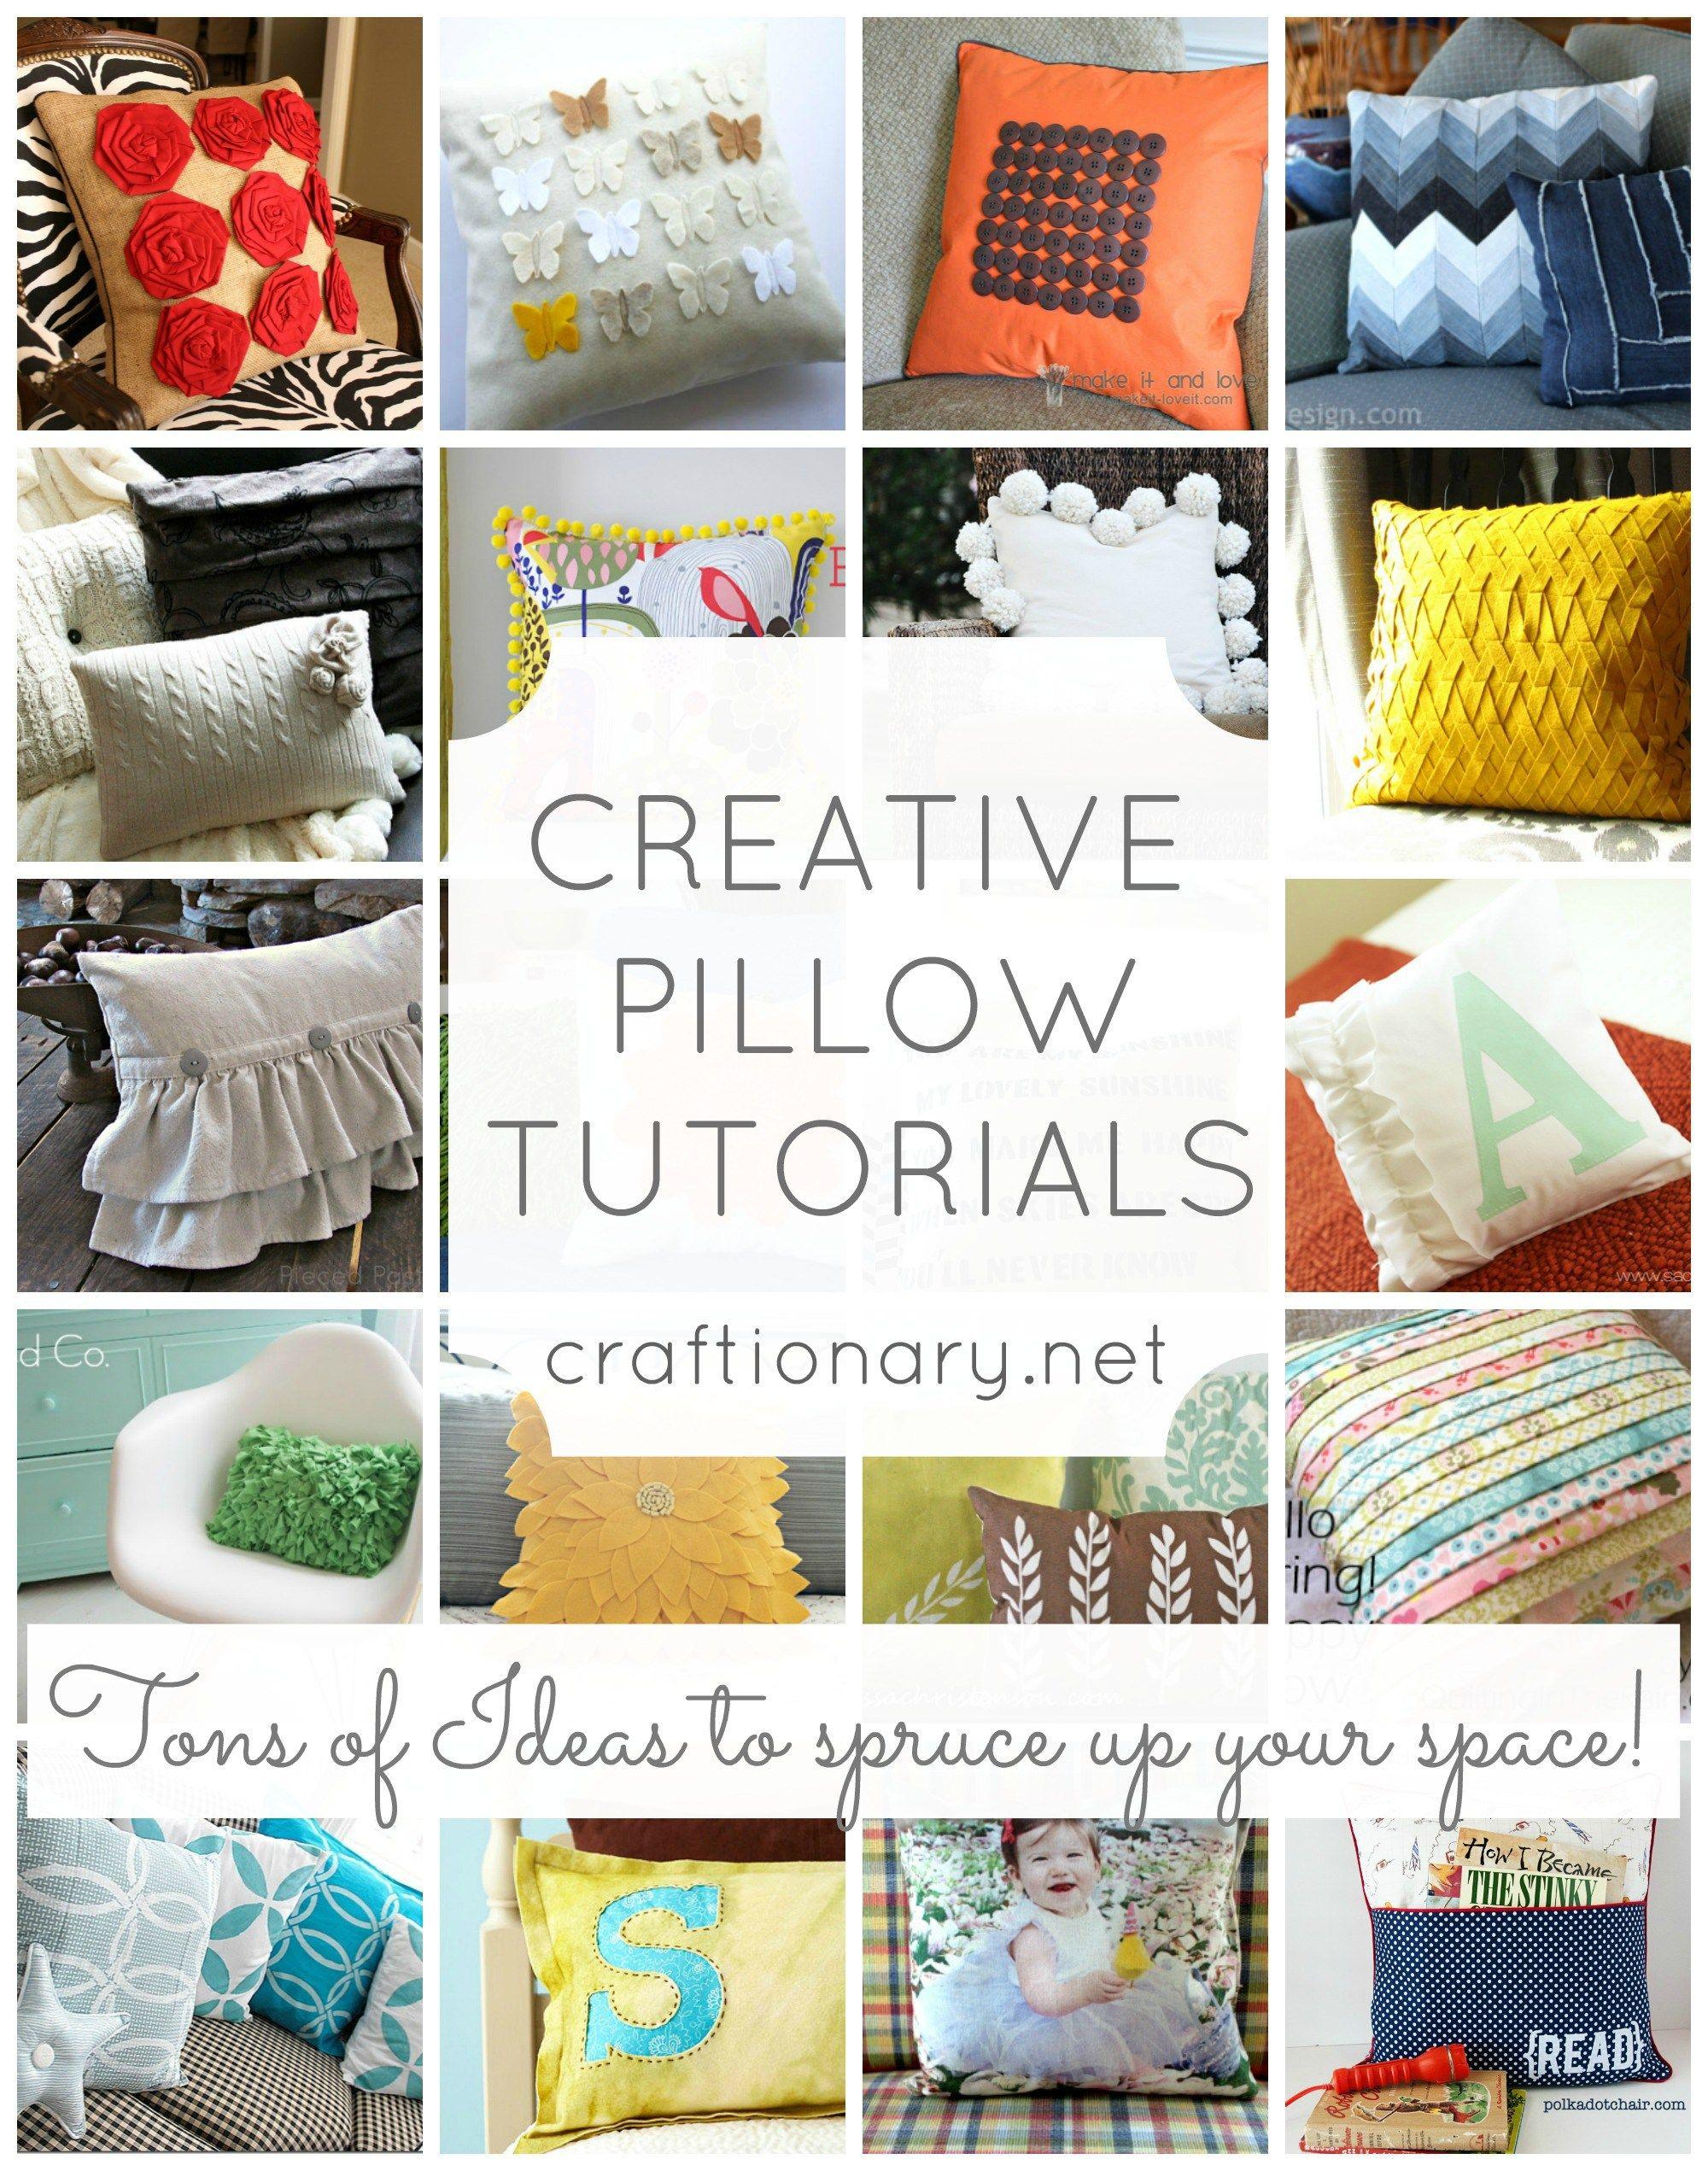 Make Decorative Pillow Tutorials Creative Pillows Diy Pillows Pillow Tutorial